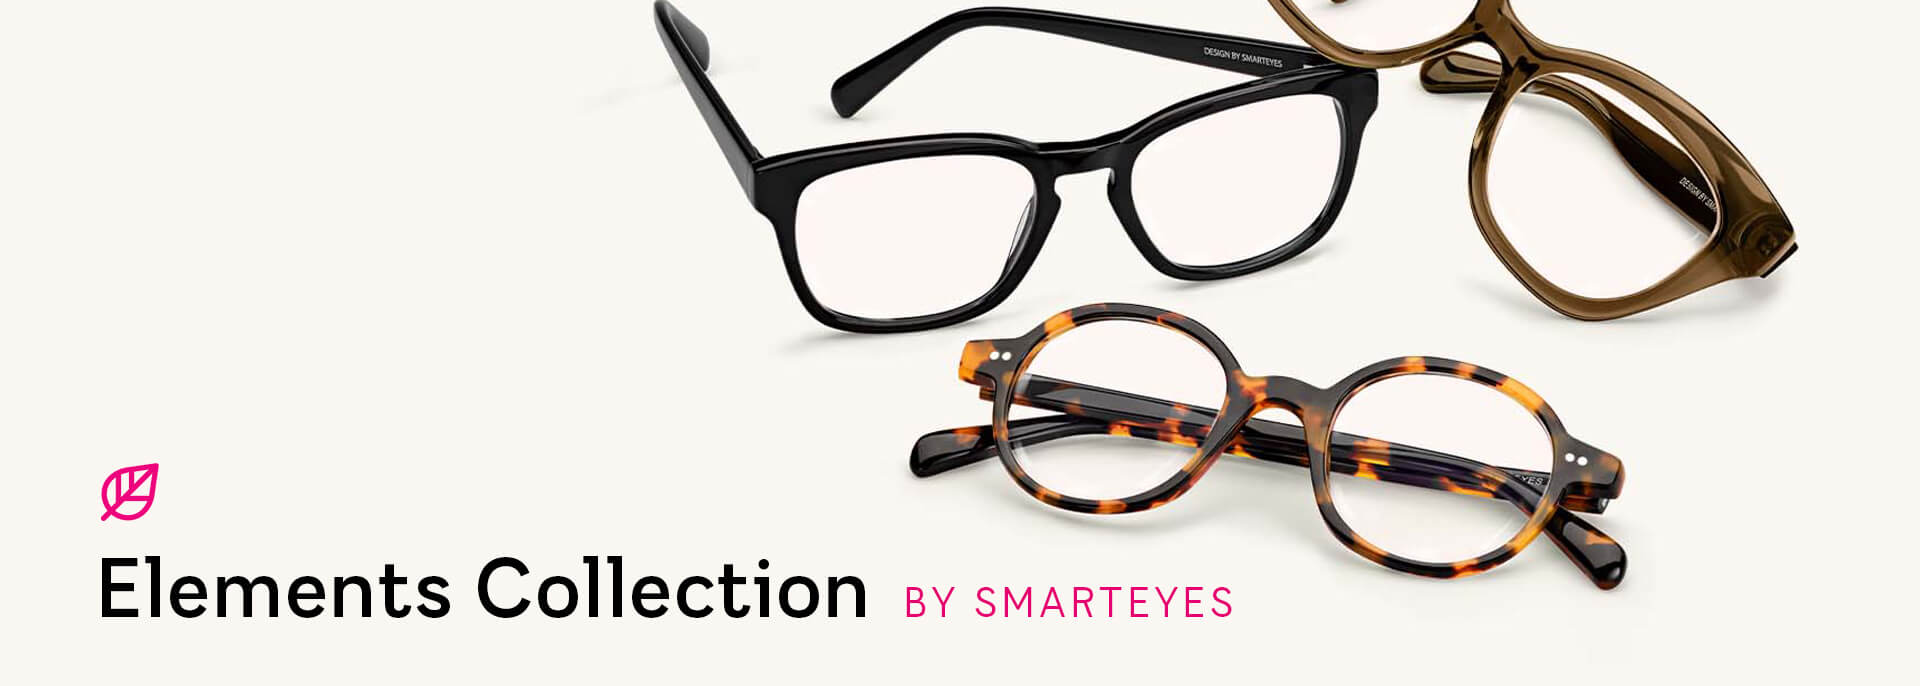 Elements Collection by Smarteyes - en mer miljövänlig glasögonkollektion